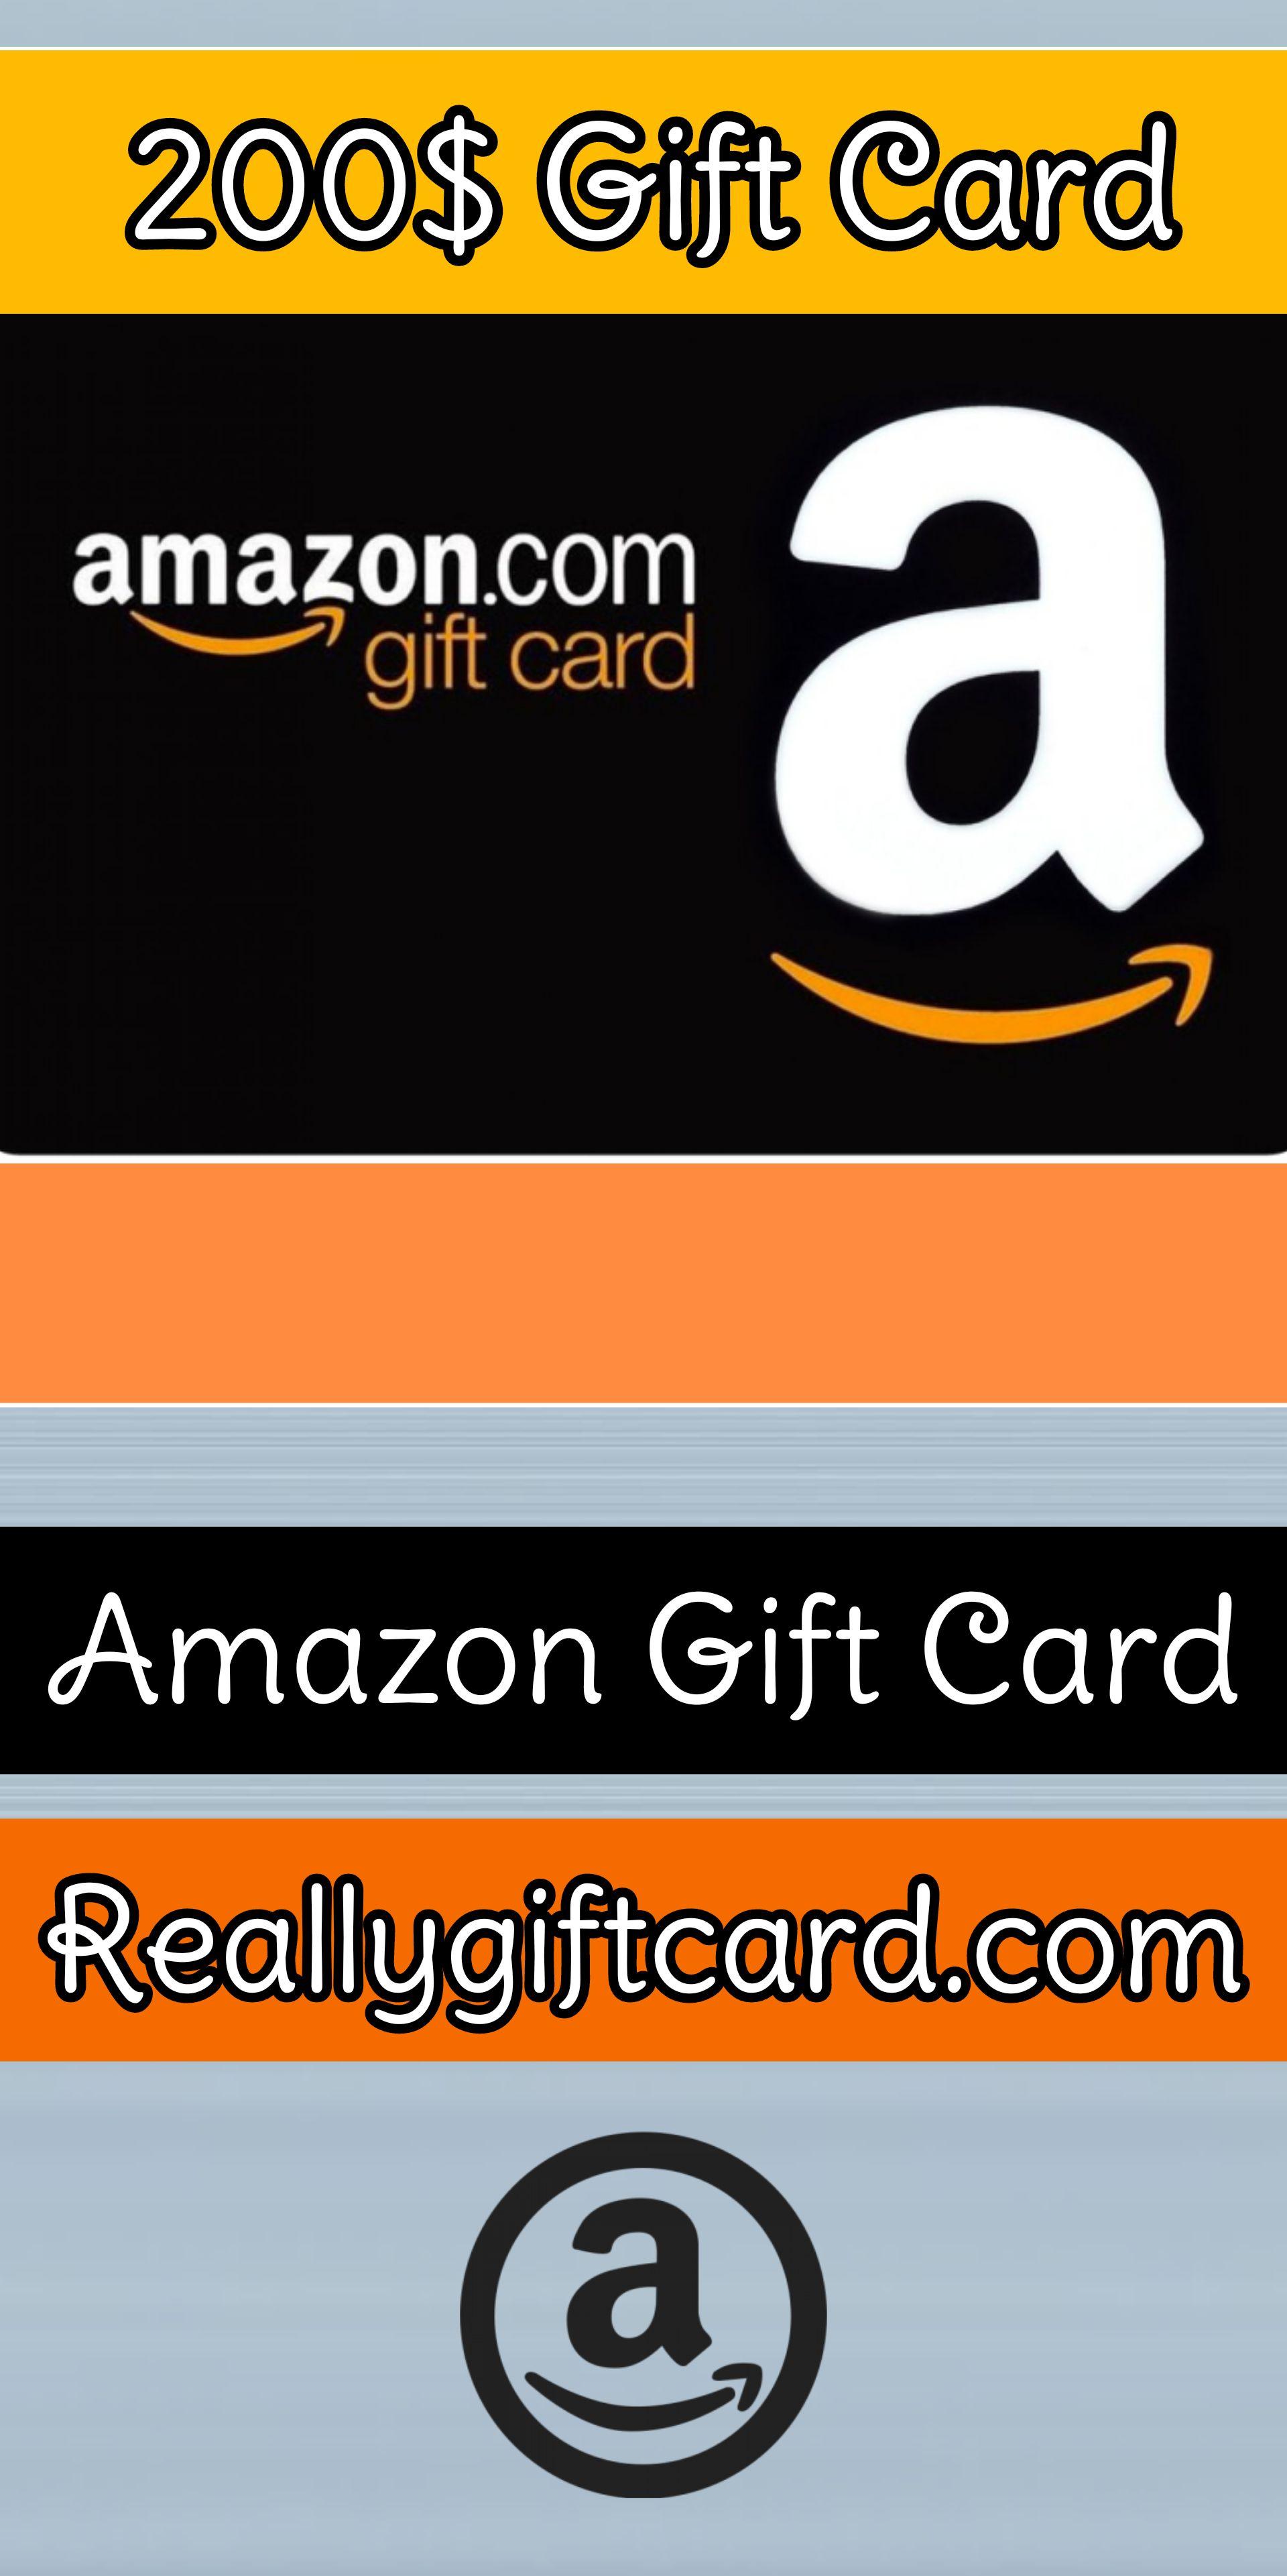 200 Amazon Gift Card If You Activate Today Amazon Gift Card Free Amazon Gift Cards Amazon Gifts